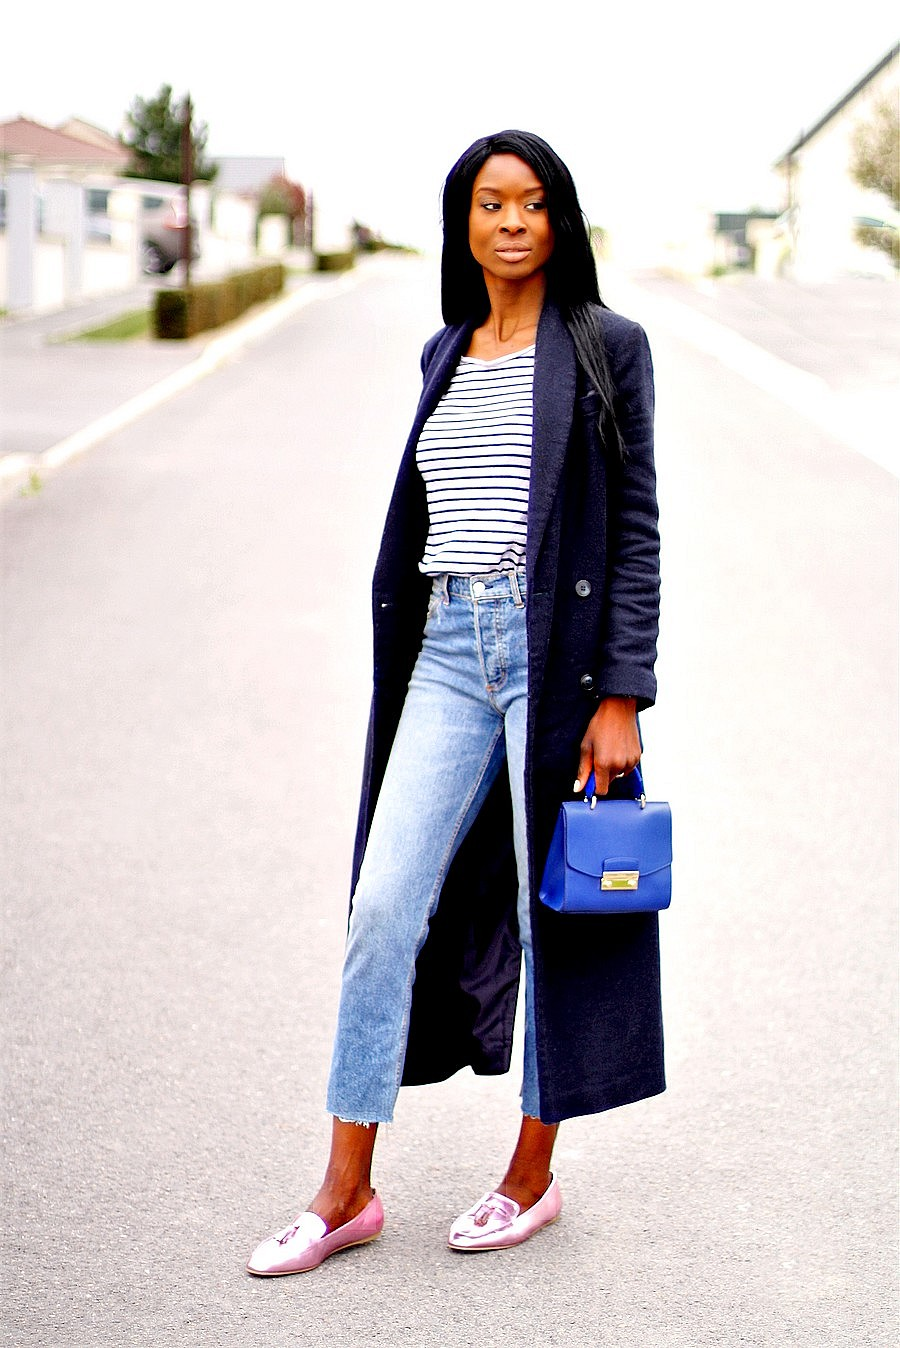 manteau-long-mariniere-jeans-taille-haute-mocassins-sac-furla